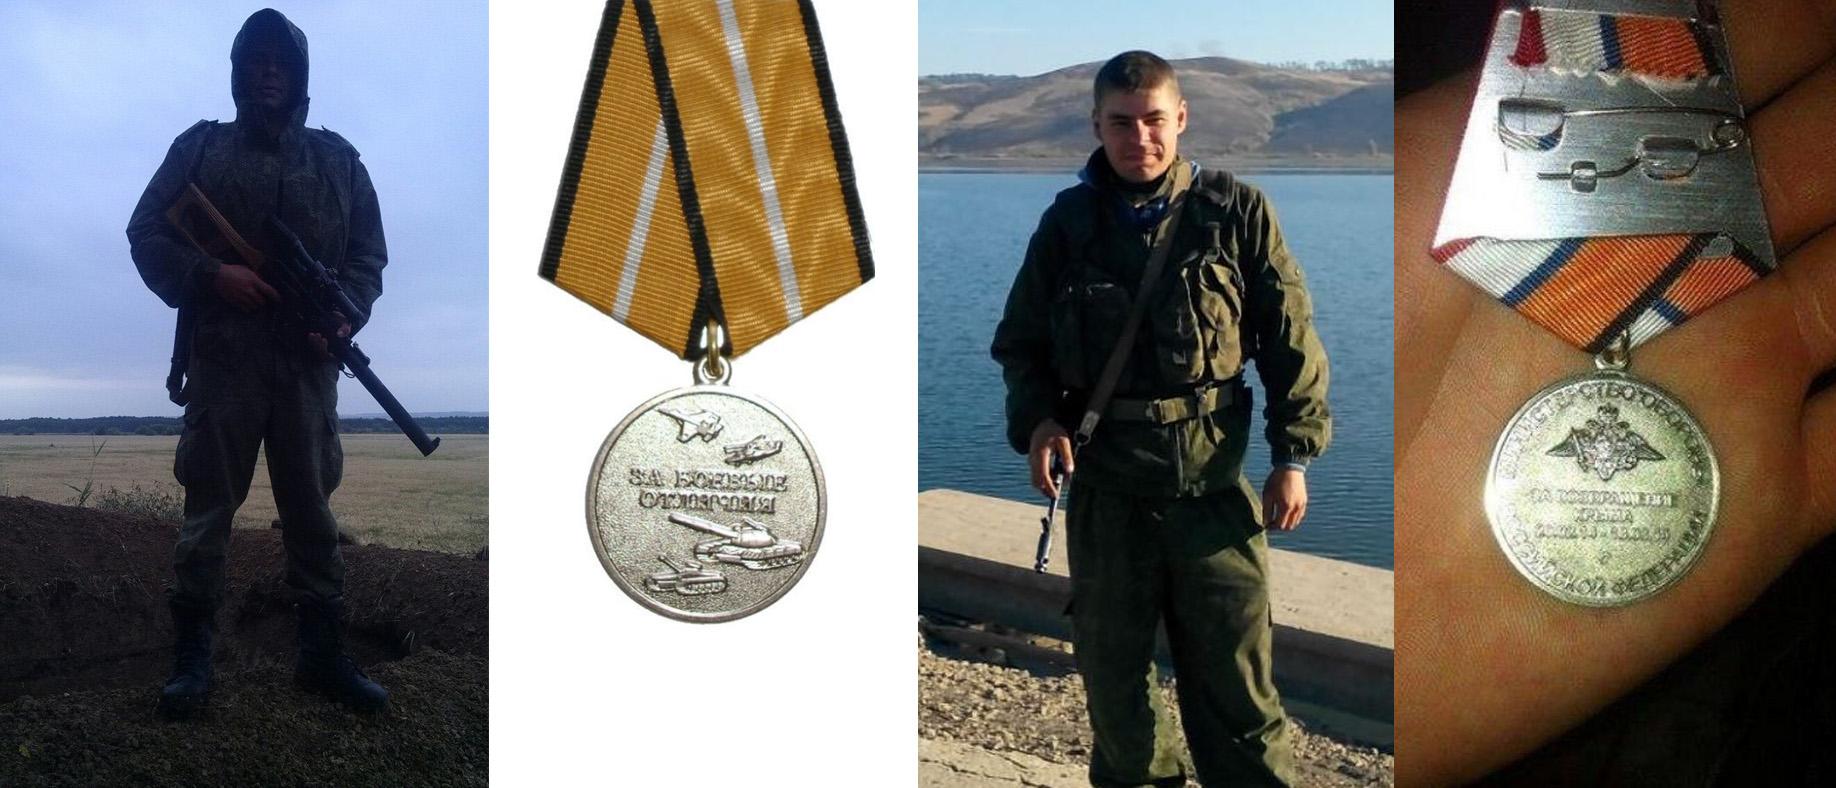 Nikolai Plotnikov fra den russiske 15. motoriserede riffelbrigade